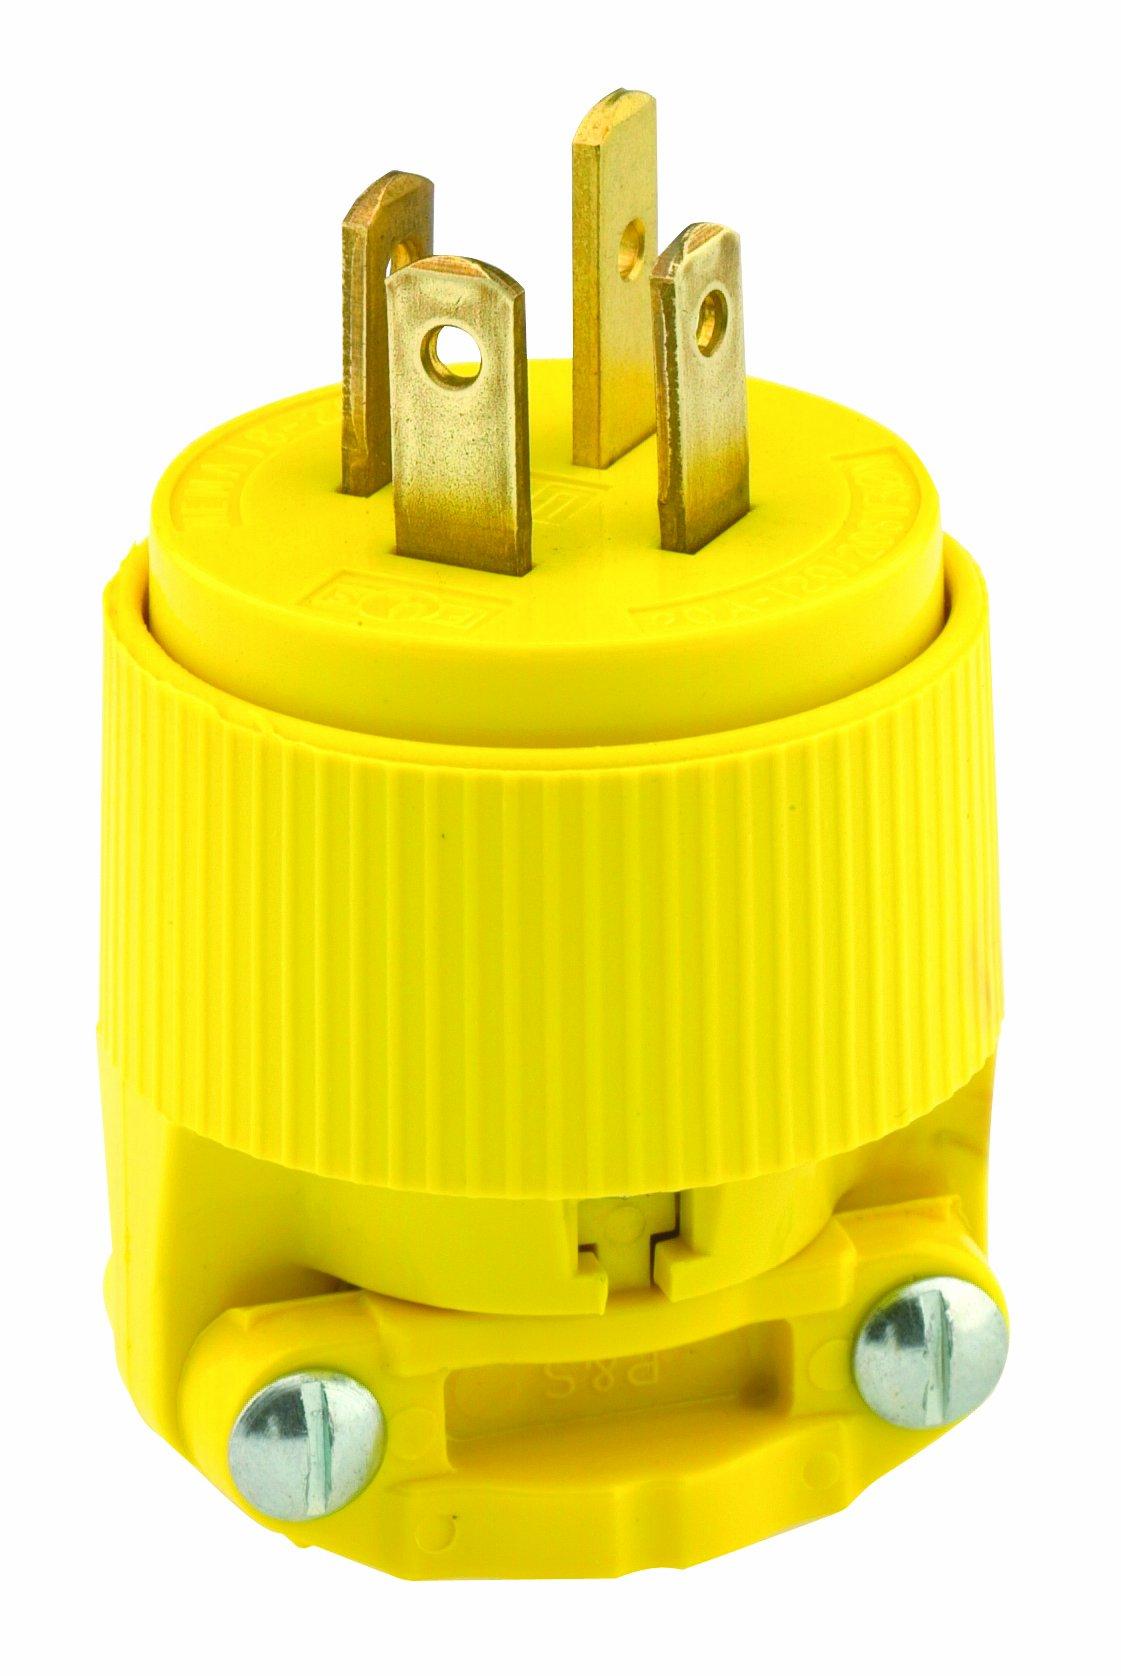 Leviton 7251-C 20-Amp, 120/208 Volt- 3PY, Straight Blade, Plug, Industrial Grade, Non-Grounding, Yellow